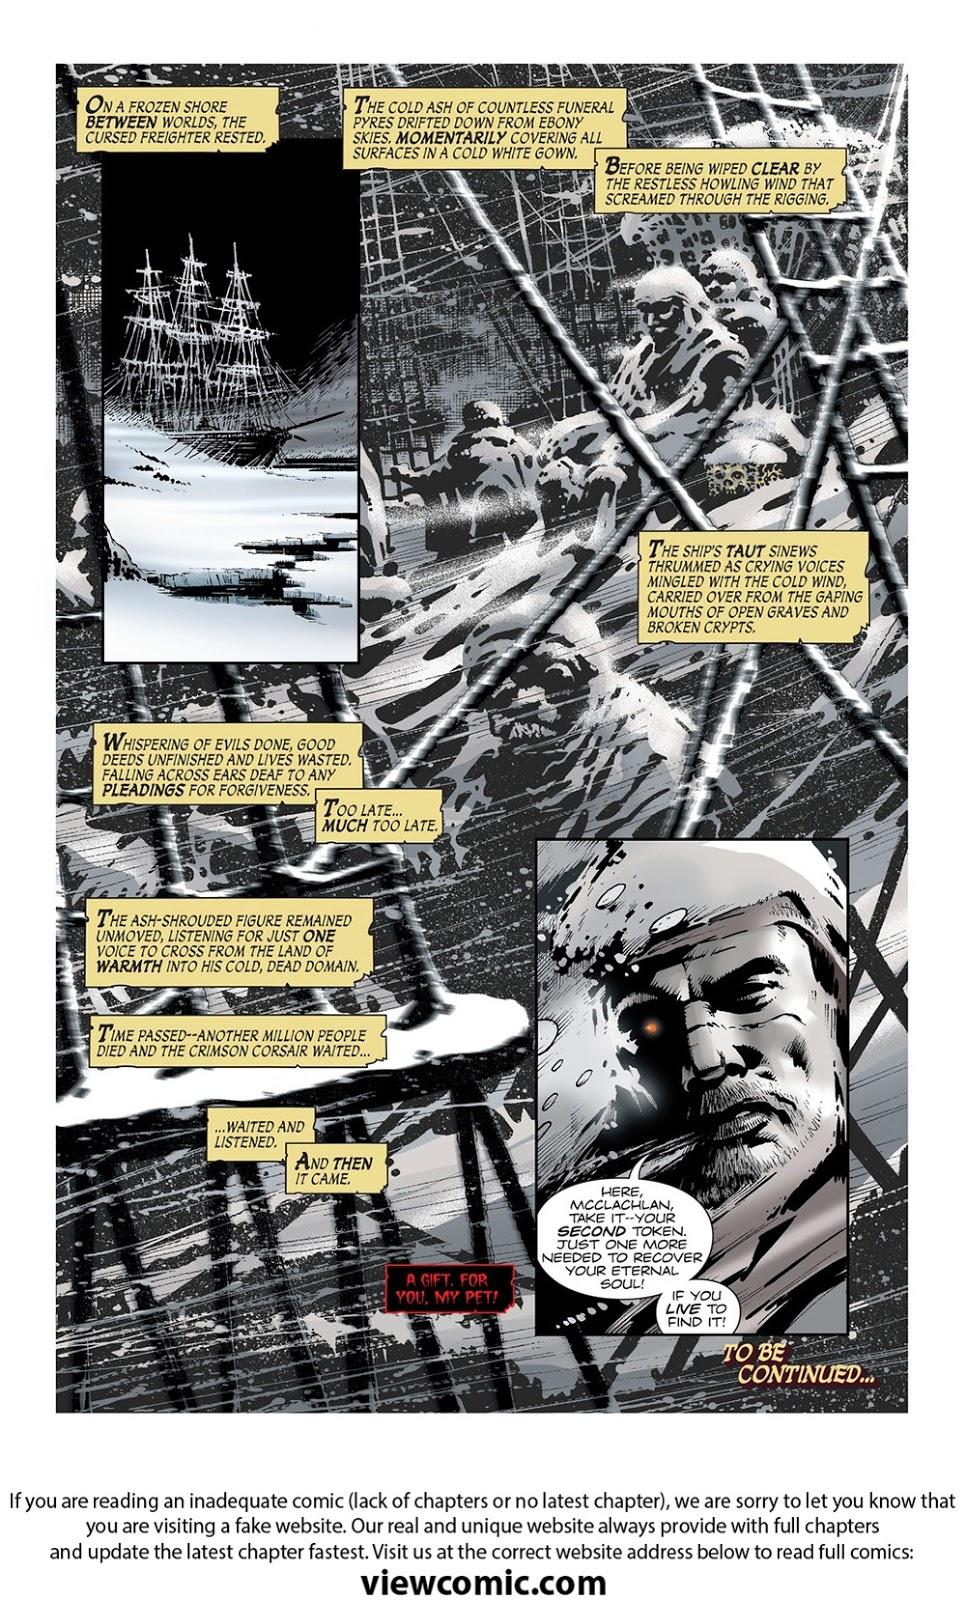 watchmen viewcomic reading comics online for free 2018